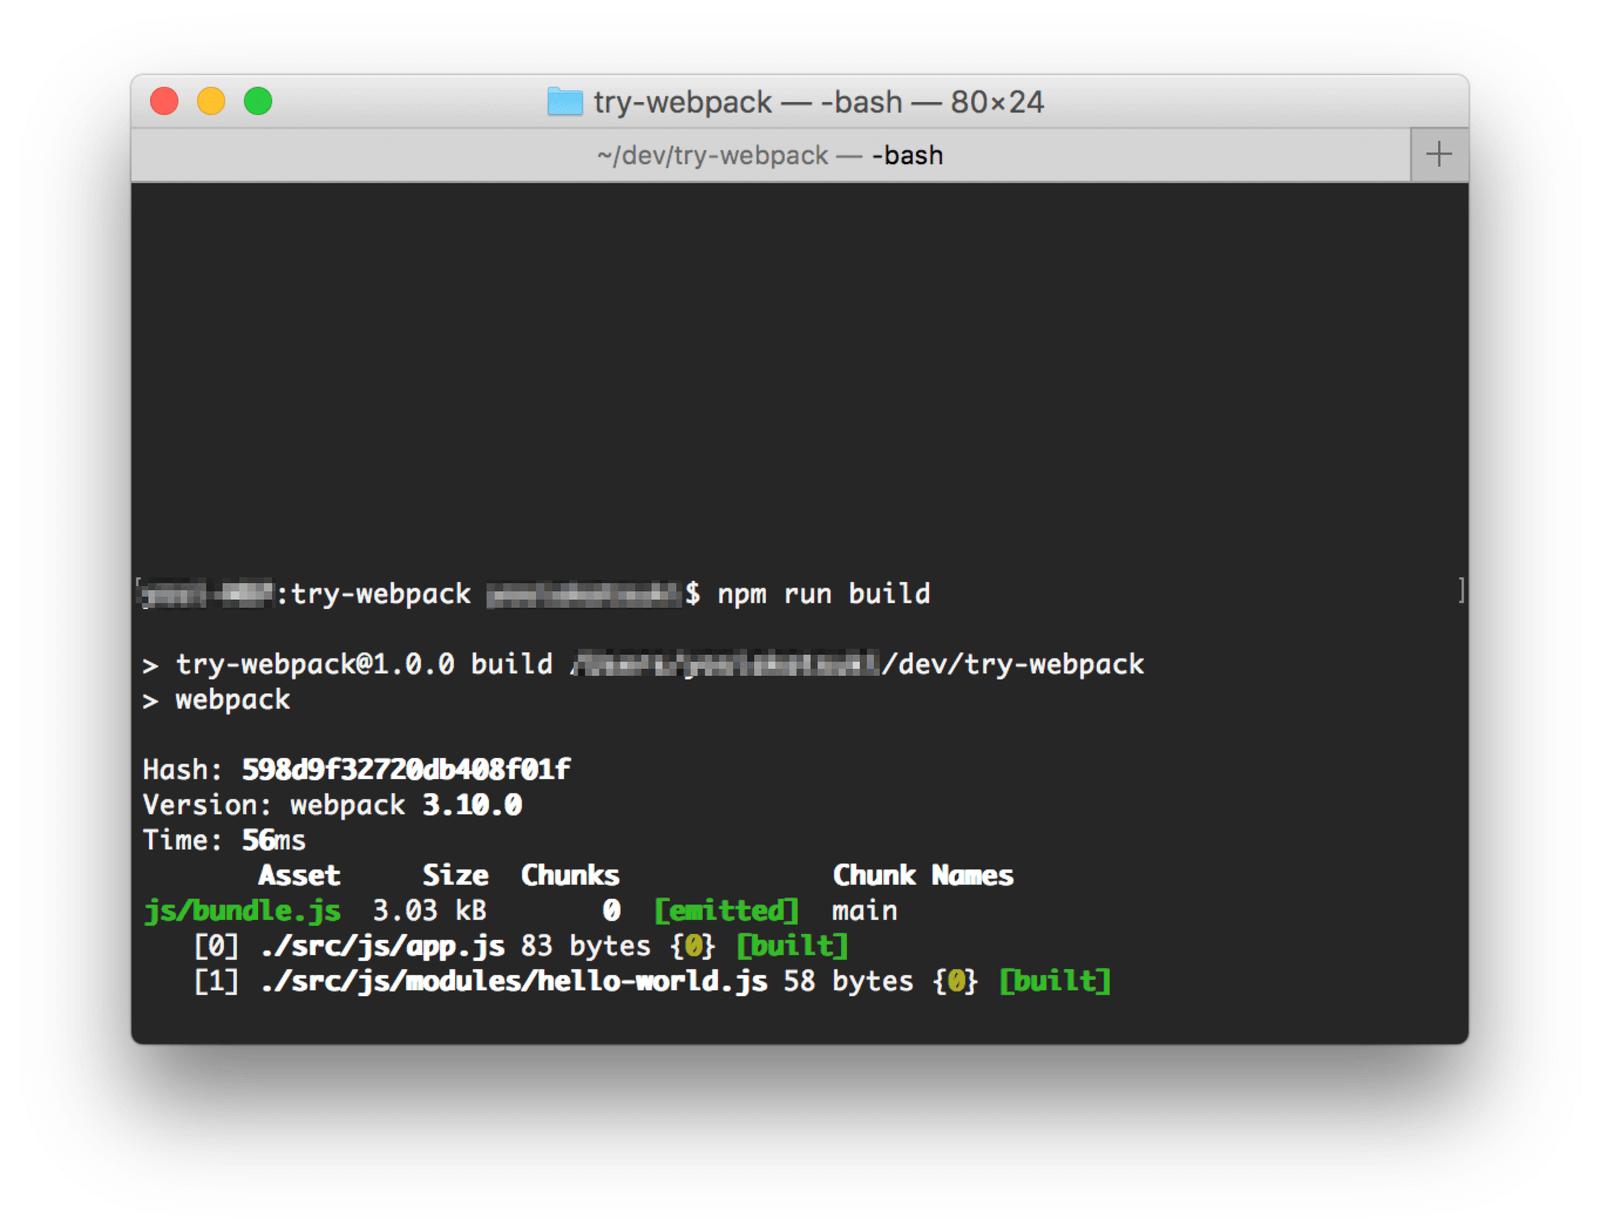 webpackのビルドを実行してバンドルされたJavaScriptファイルを作る